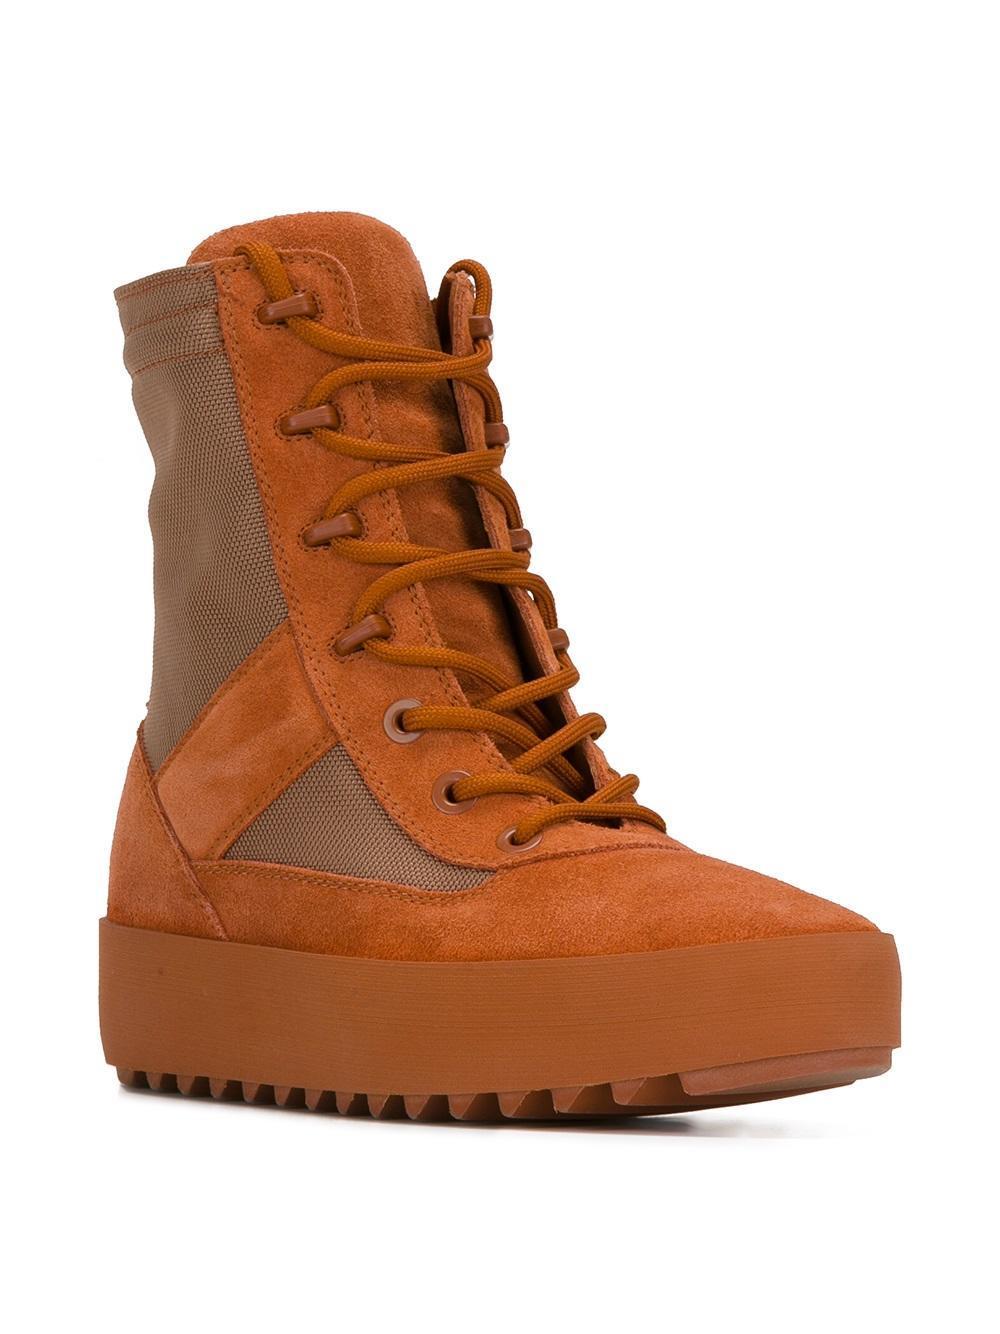 Excellent Yeezy Season 2 Crepe Boots Release Date